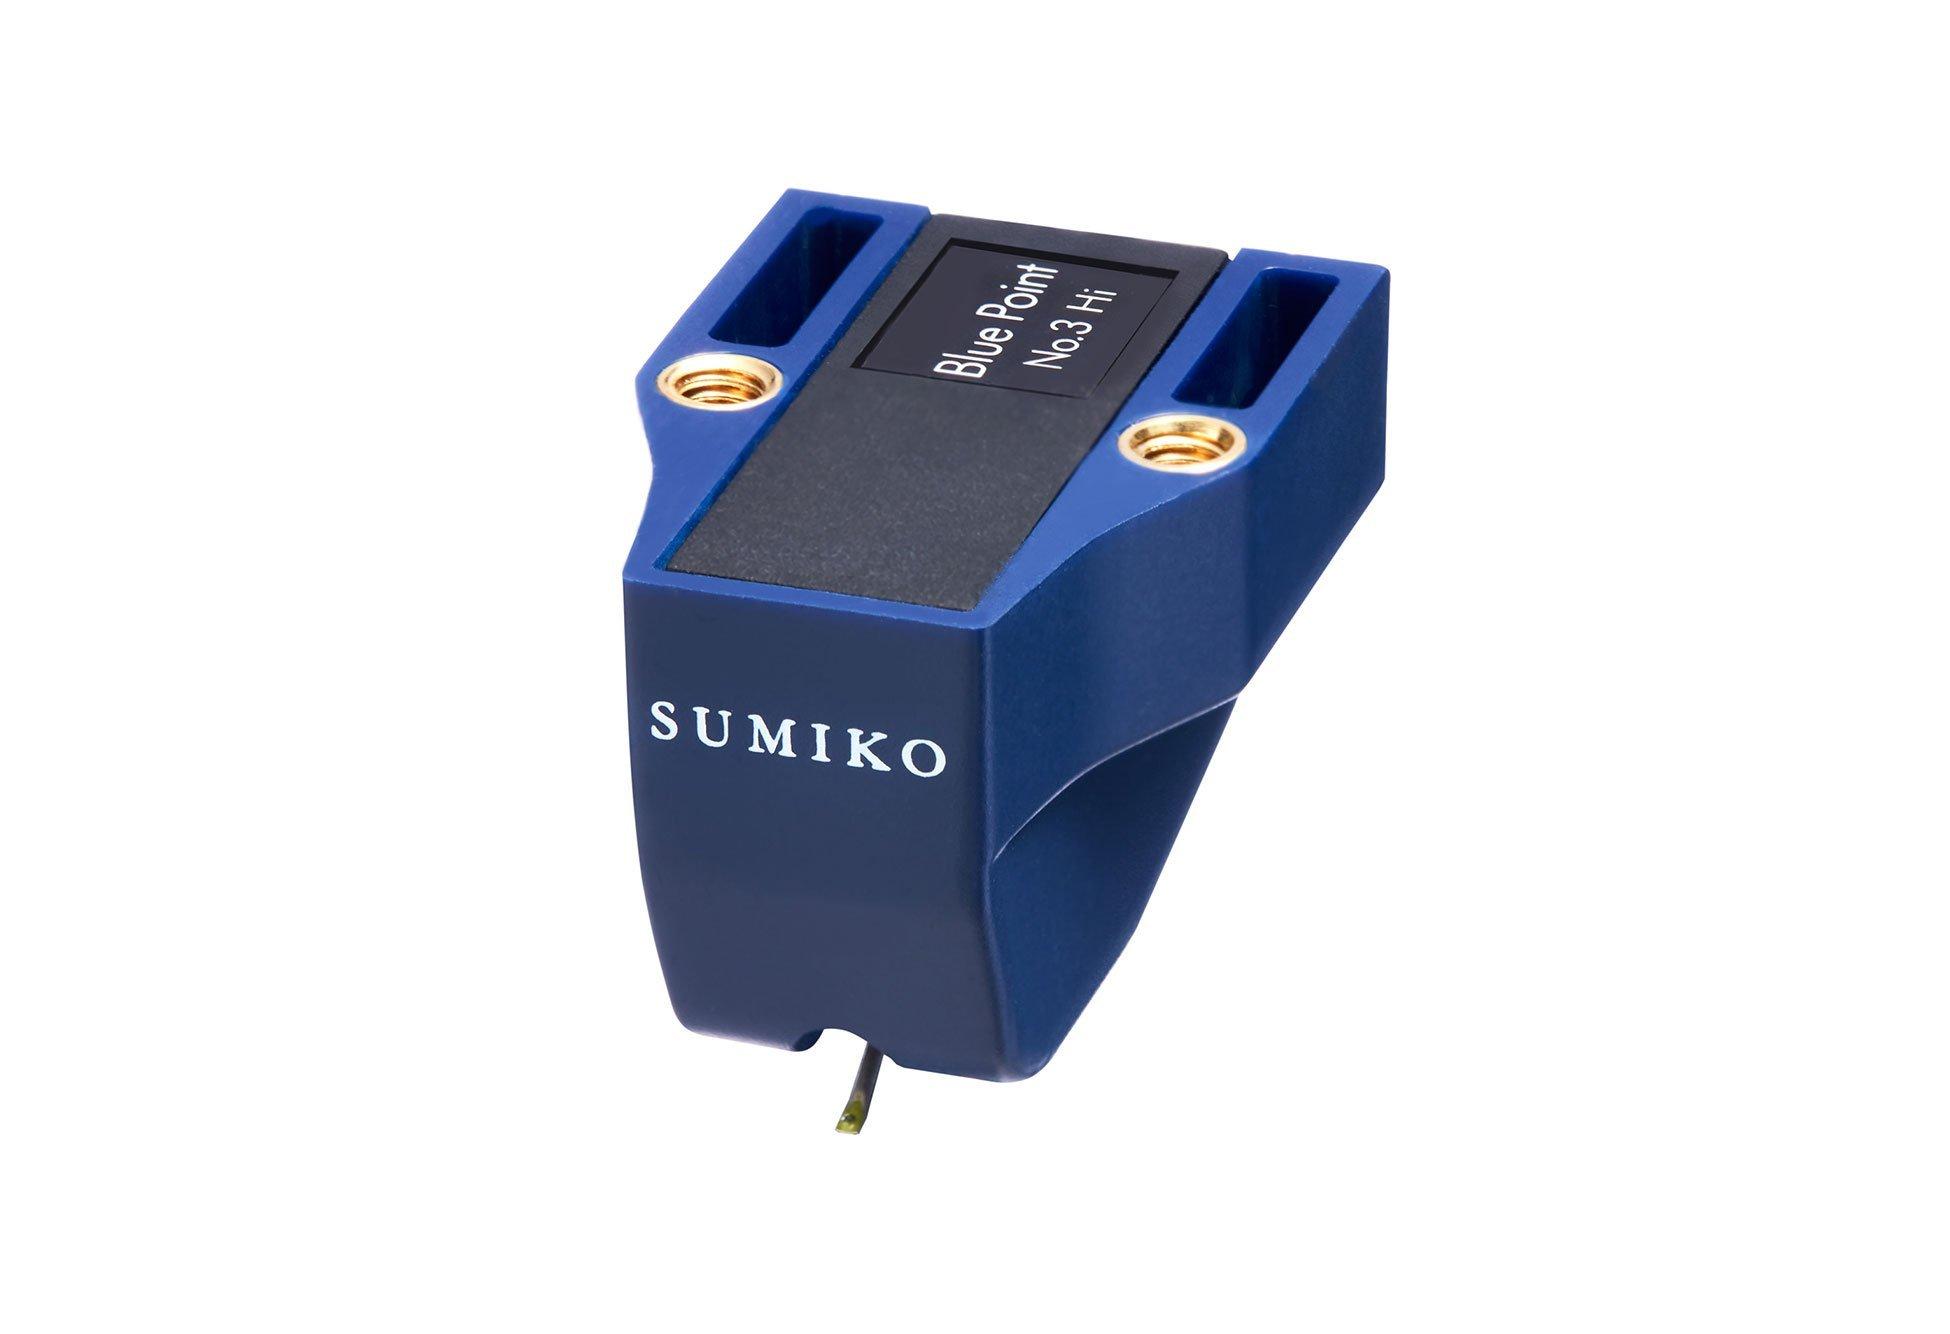 Sumiko Blue Point No. 3 High MC Tonabnehmer